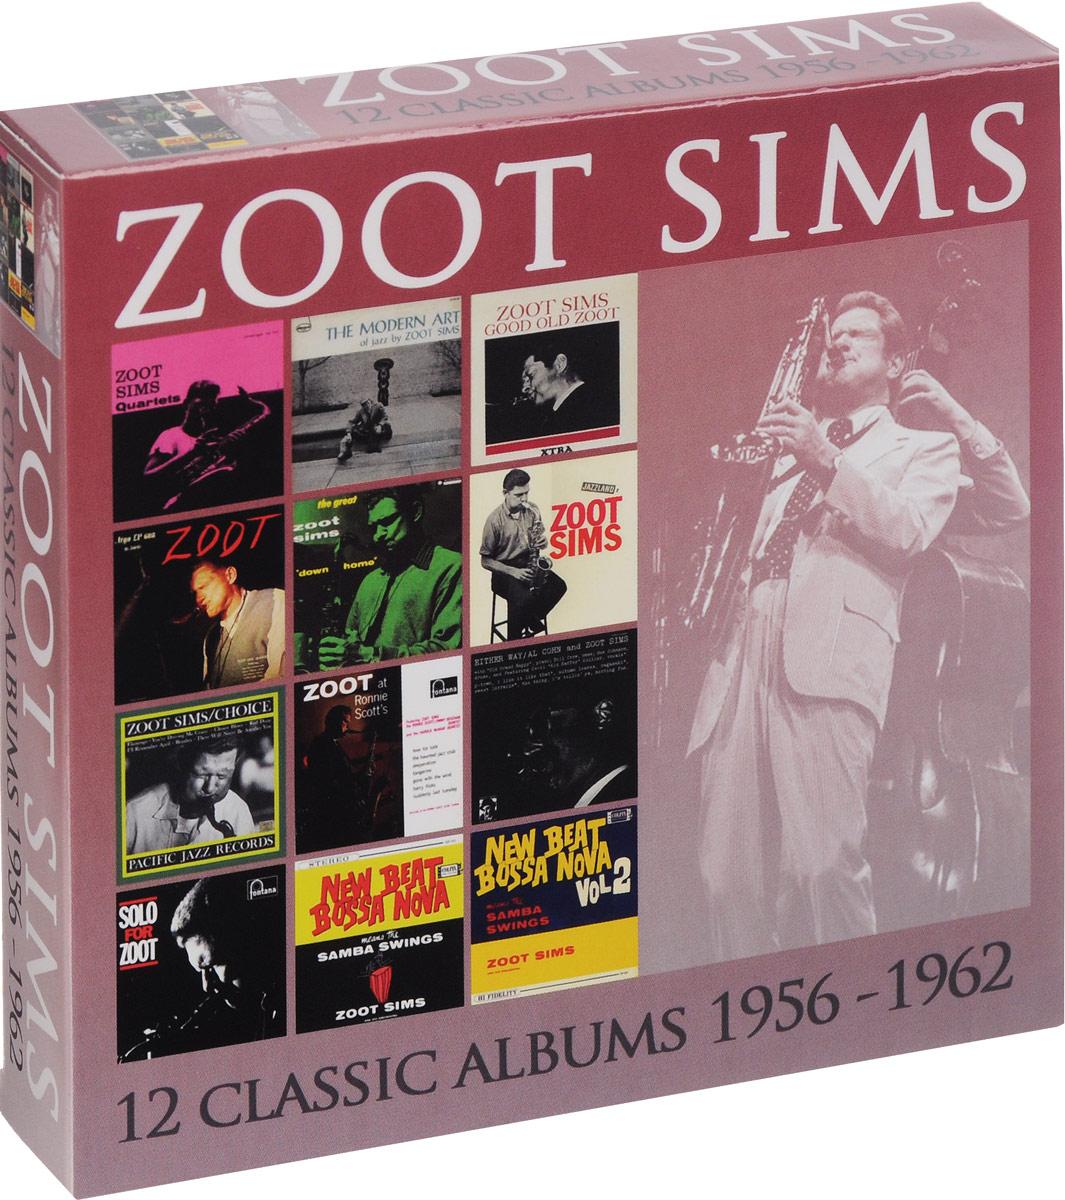 Зут Симс Zoot Sims. 12 Classic Albums 1956 - 1962 (6 CD) пила kolner kms210 1400